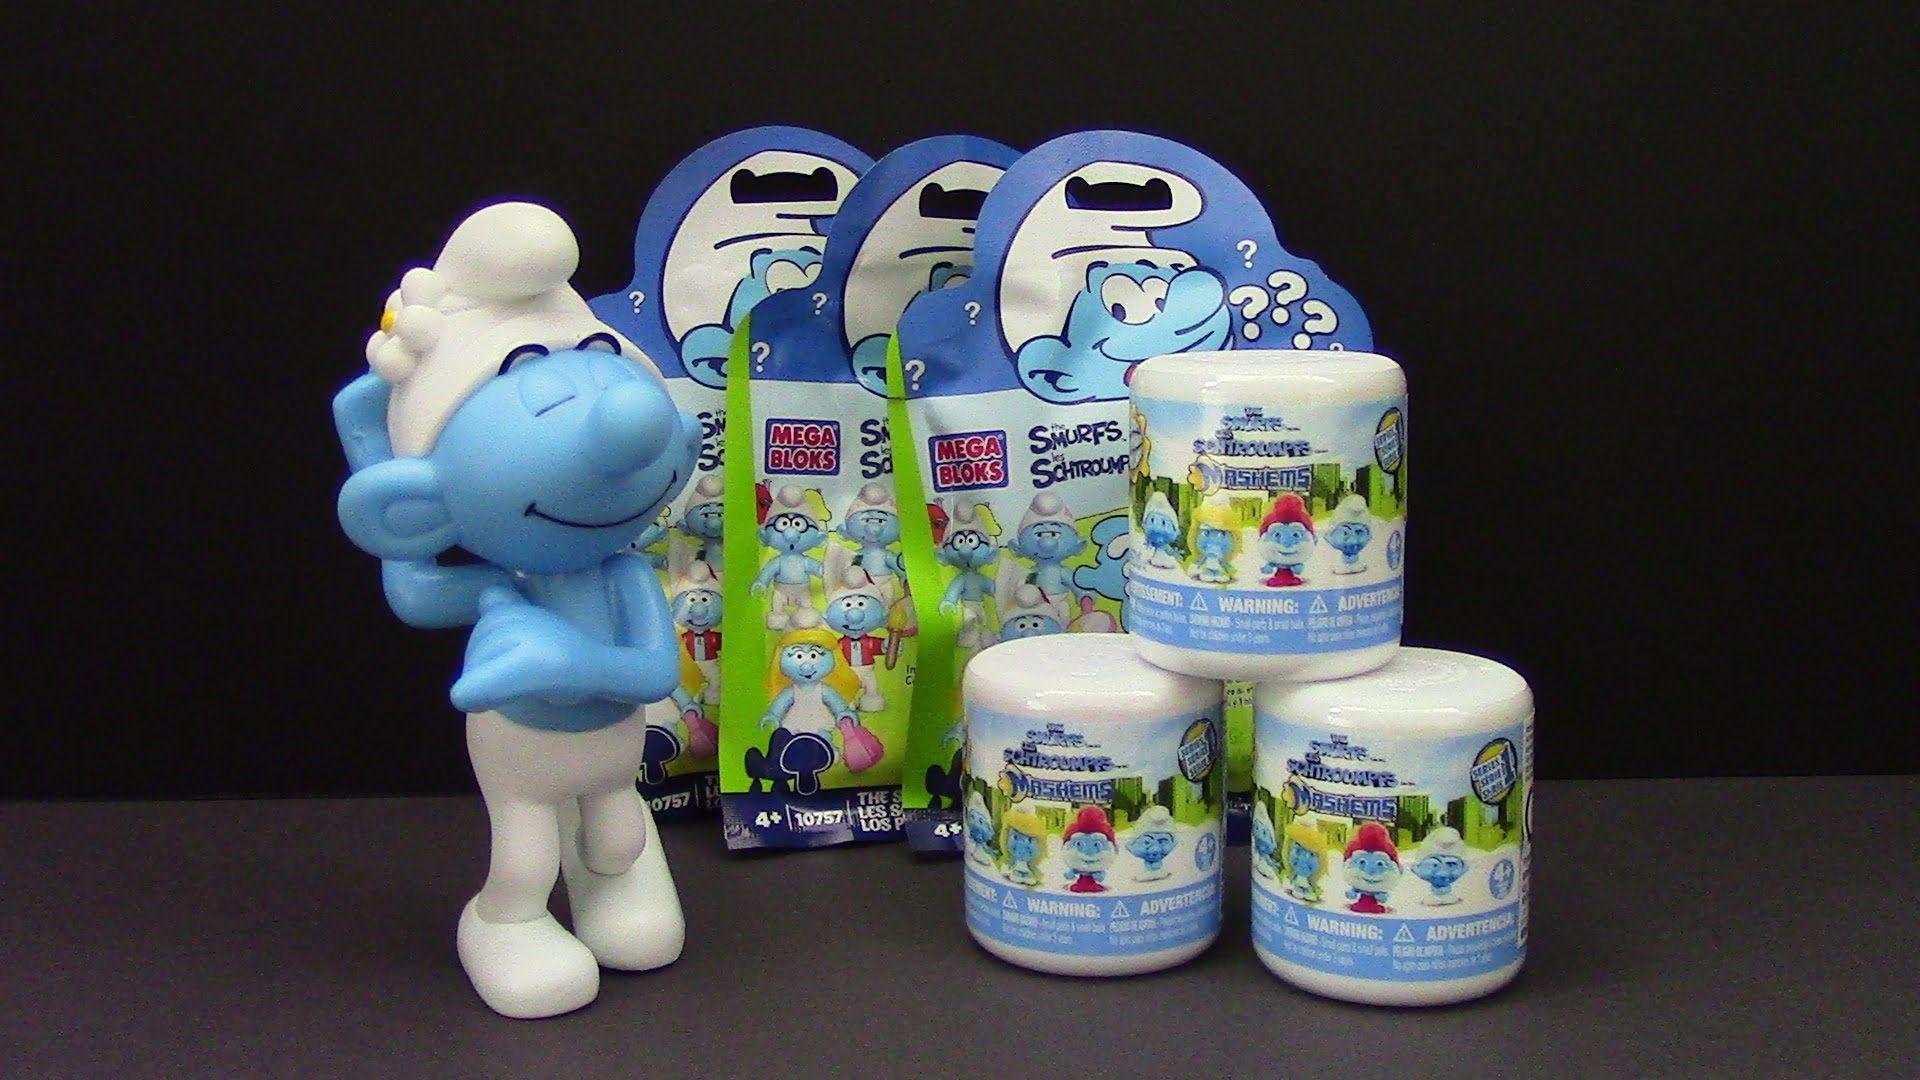 Smurf Fashems, MegaBloks SURPRISES BestToySurprises